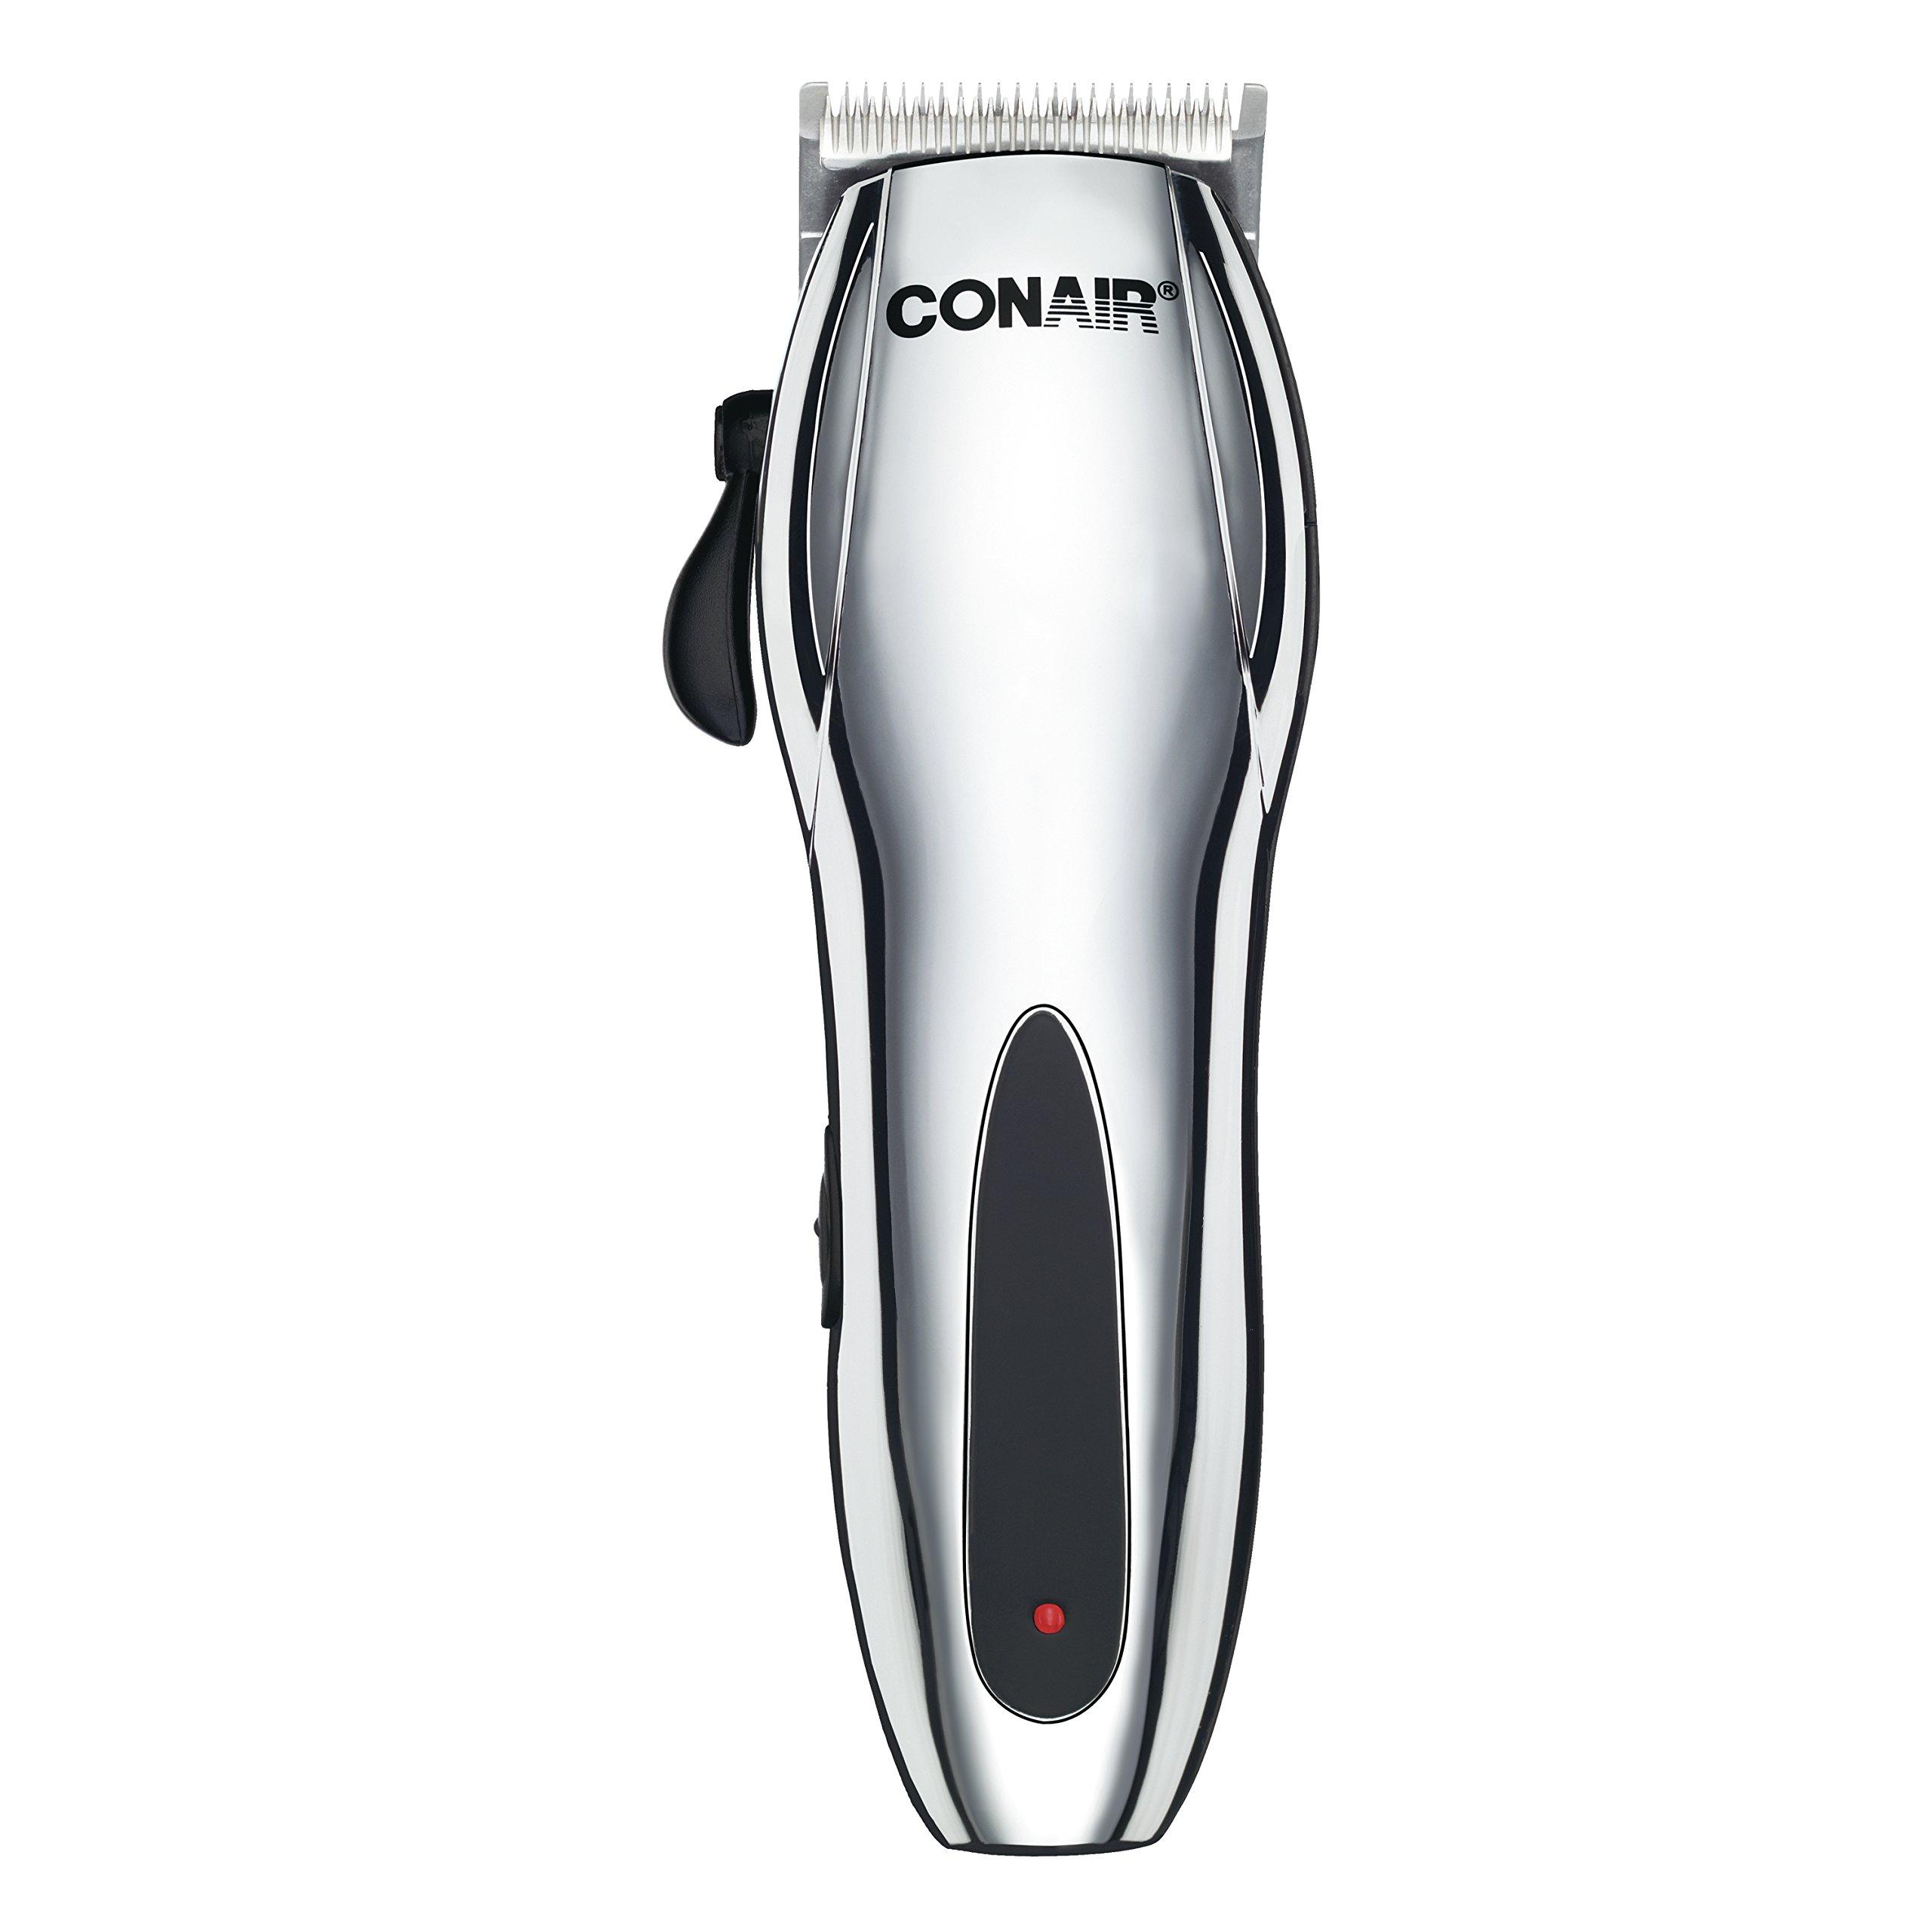 Conair Cord/Cordless Rechargeable 22-piece Haircut Kit; Home Hair Cutting Kit; Chrome by Conair